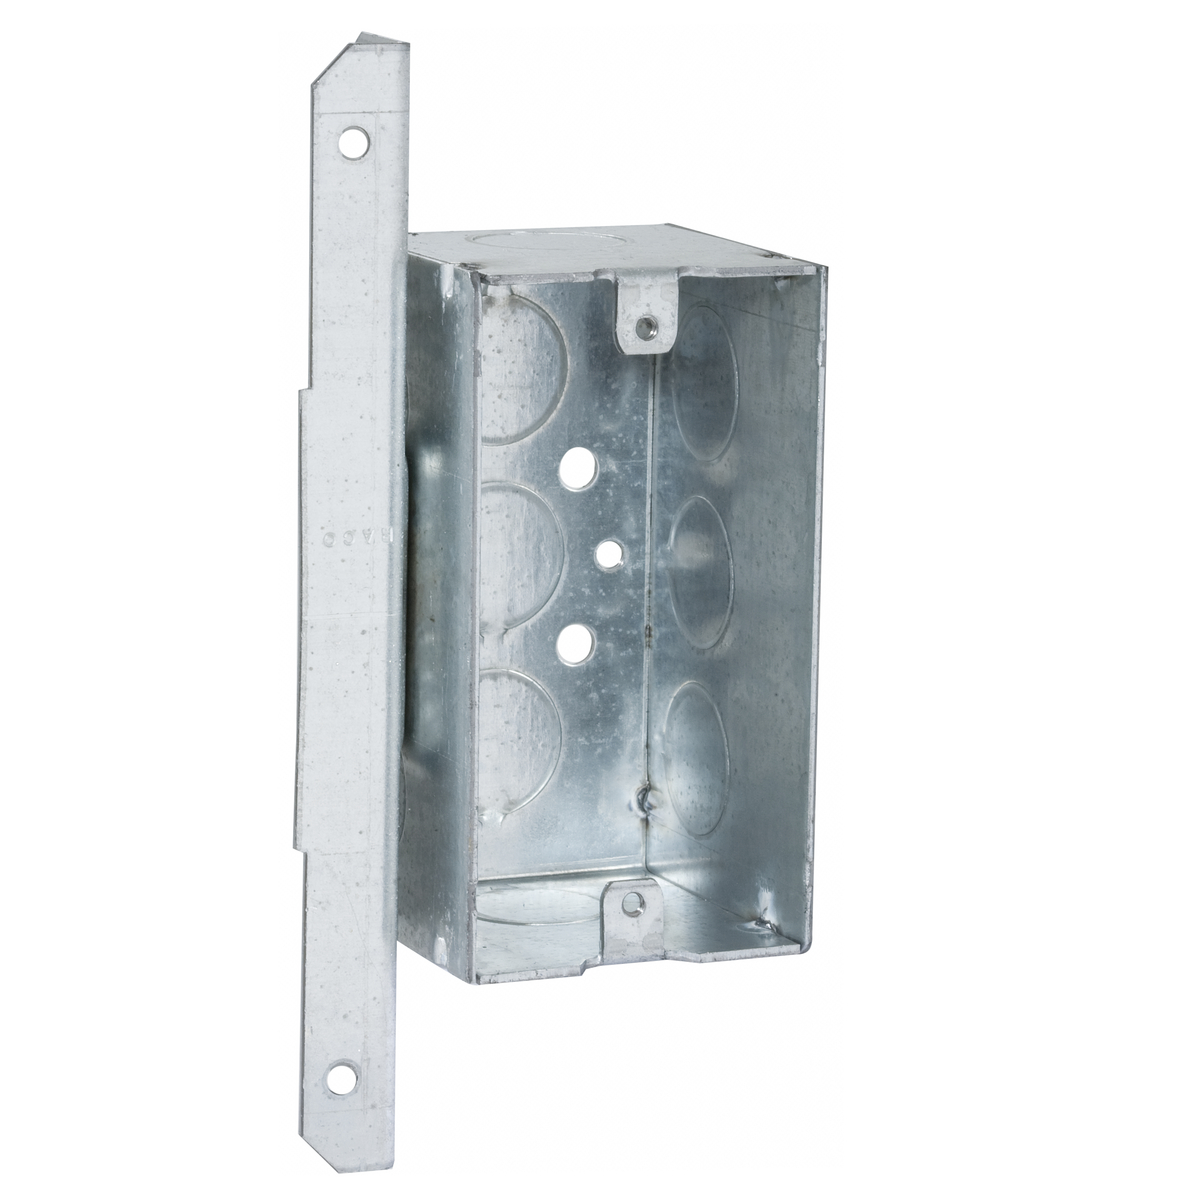 Hubbell-Raco 671 Handy Box